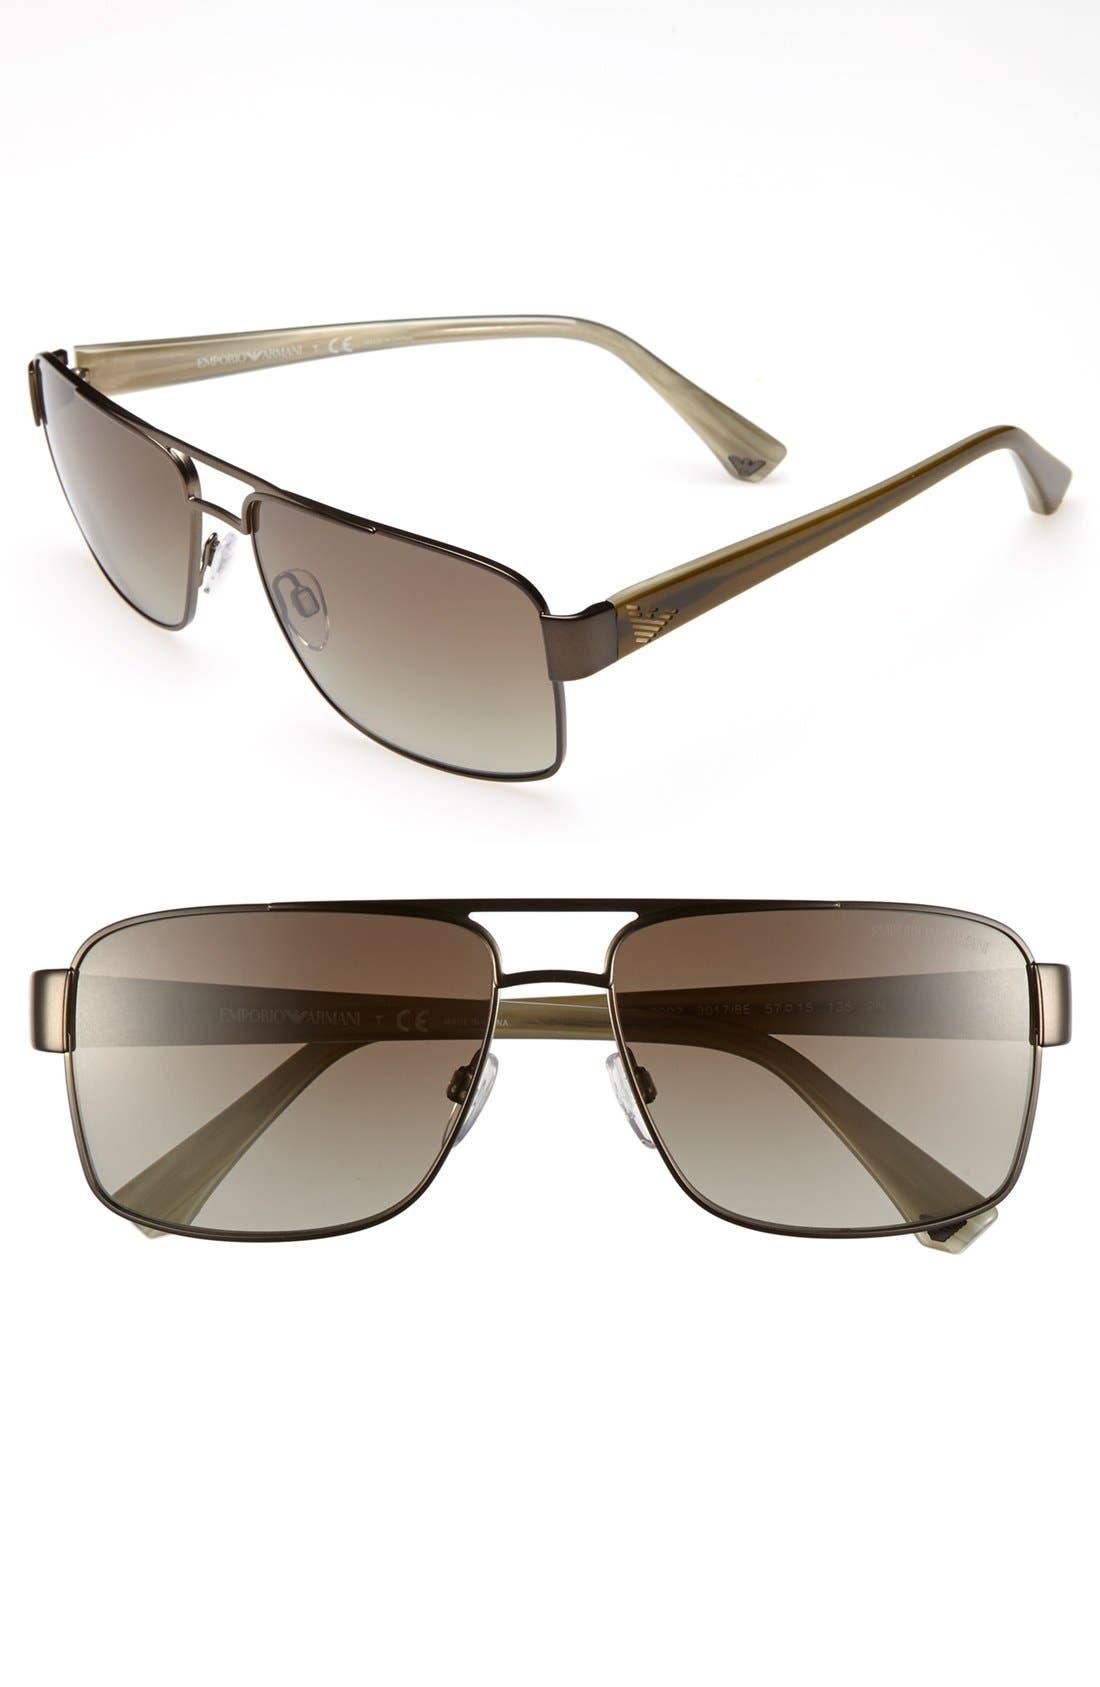 Alternate Image 1 Selected - Emporio Armani 57mm Sunglasses